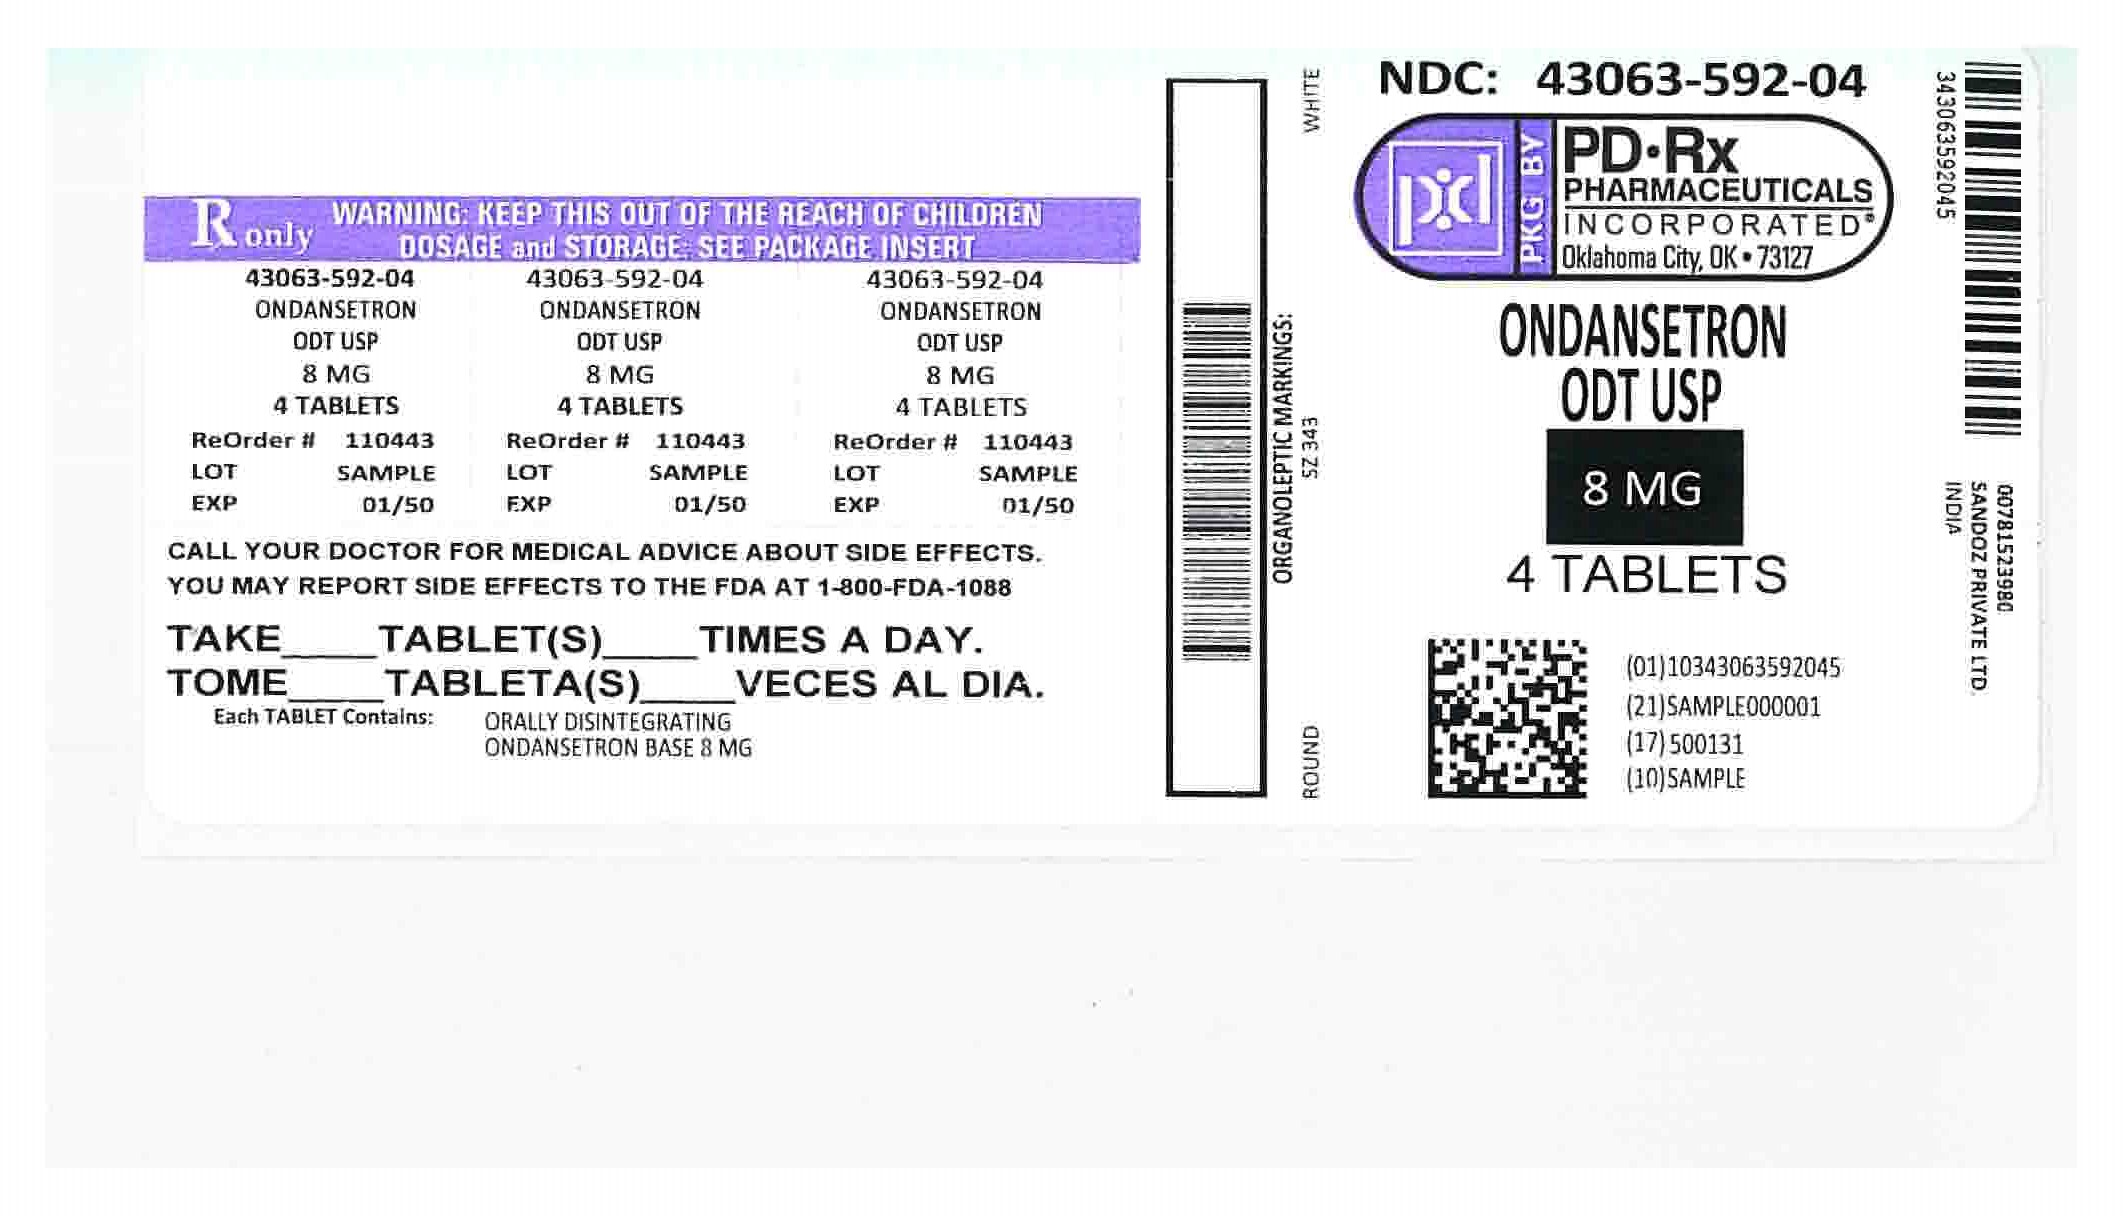 43063592 Label